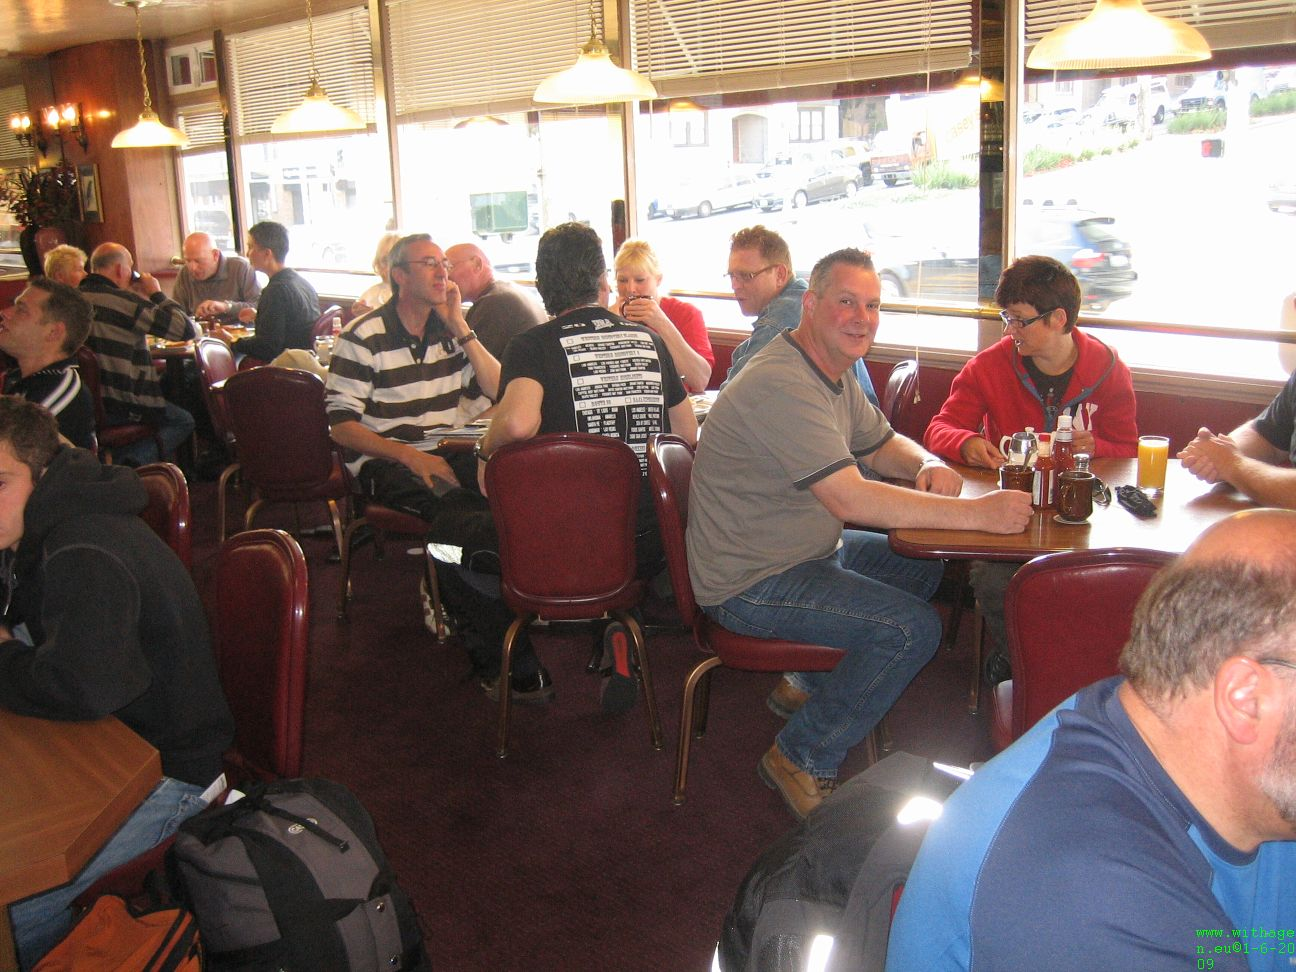 ontbijt in good old american breakfast diner SF